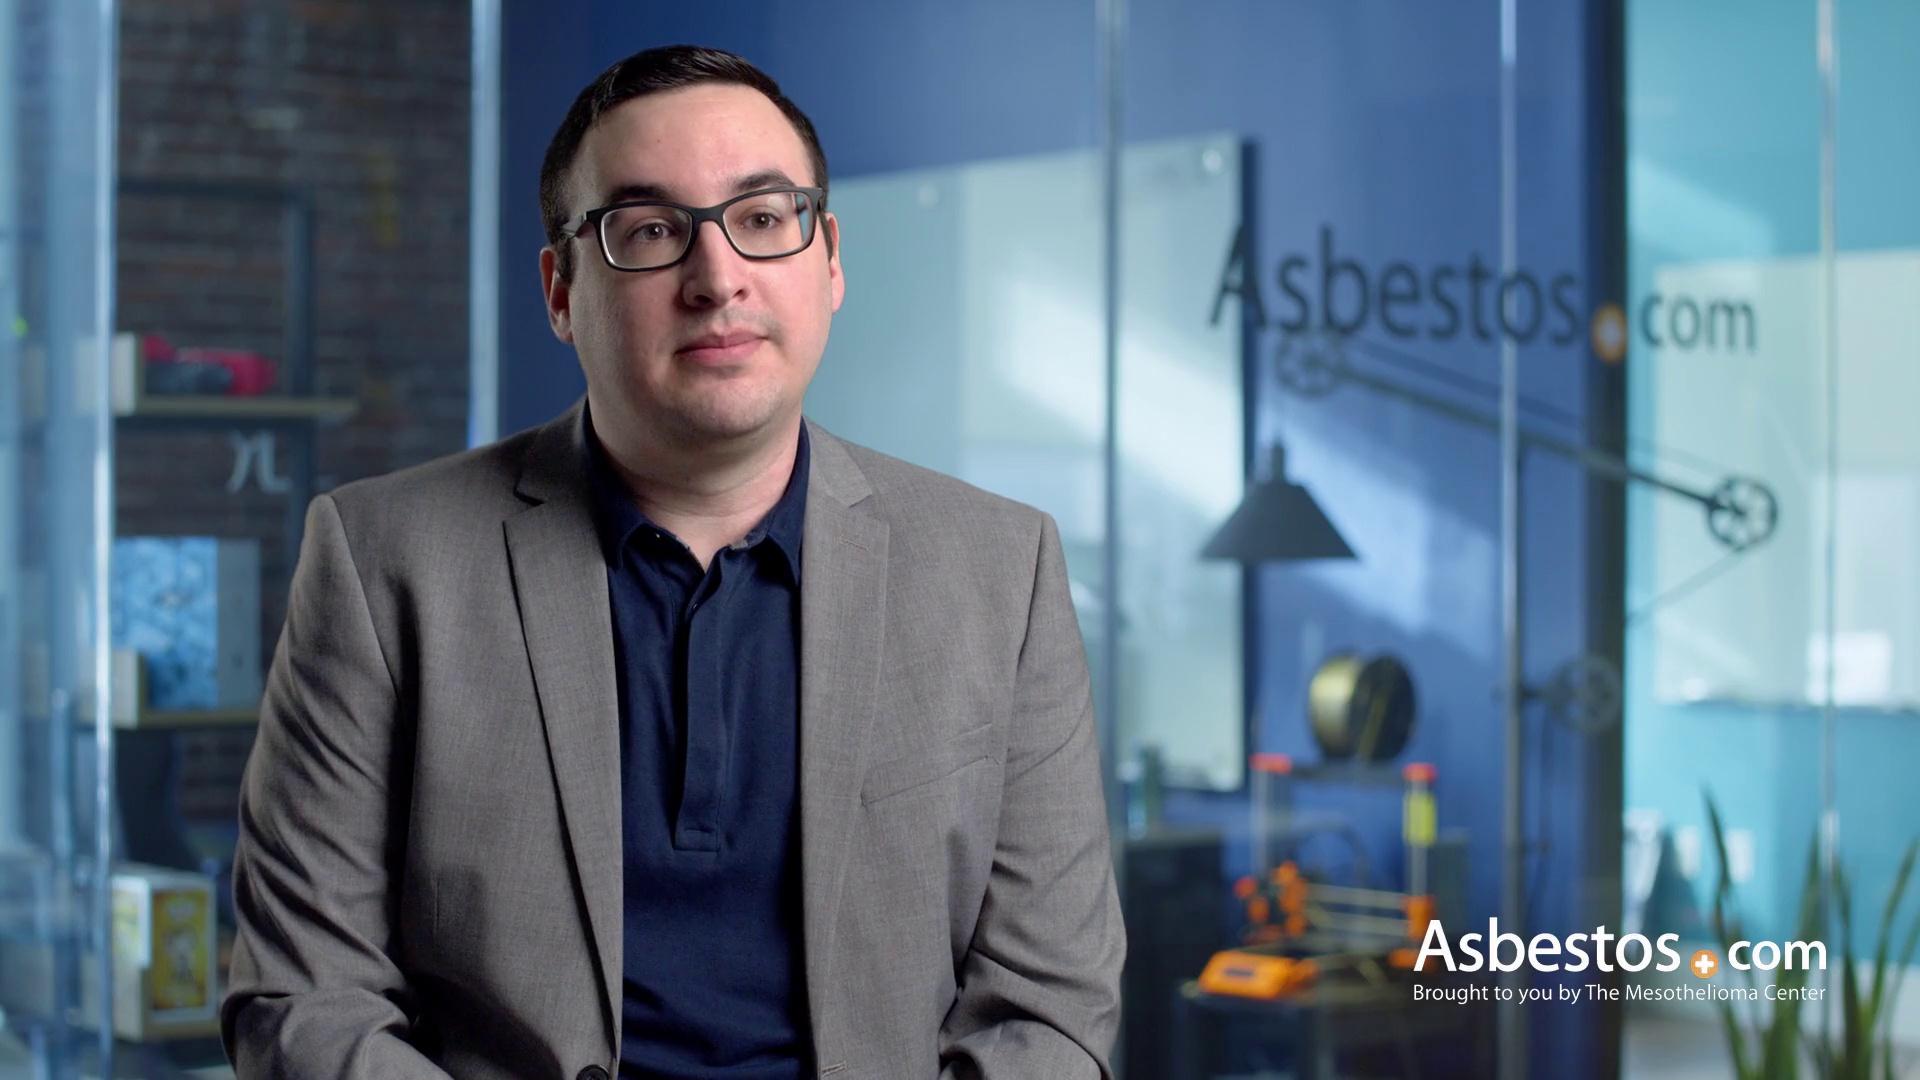 Asbestos Lung Cancer Surgery